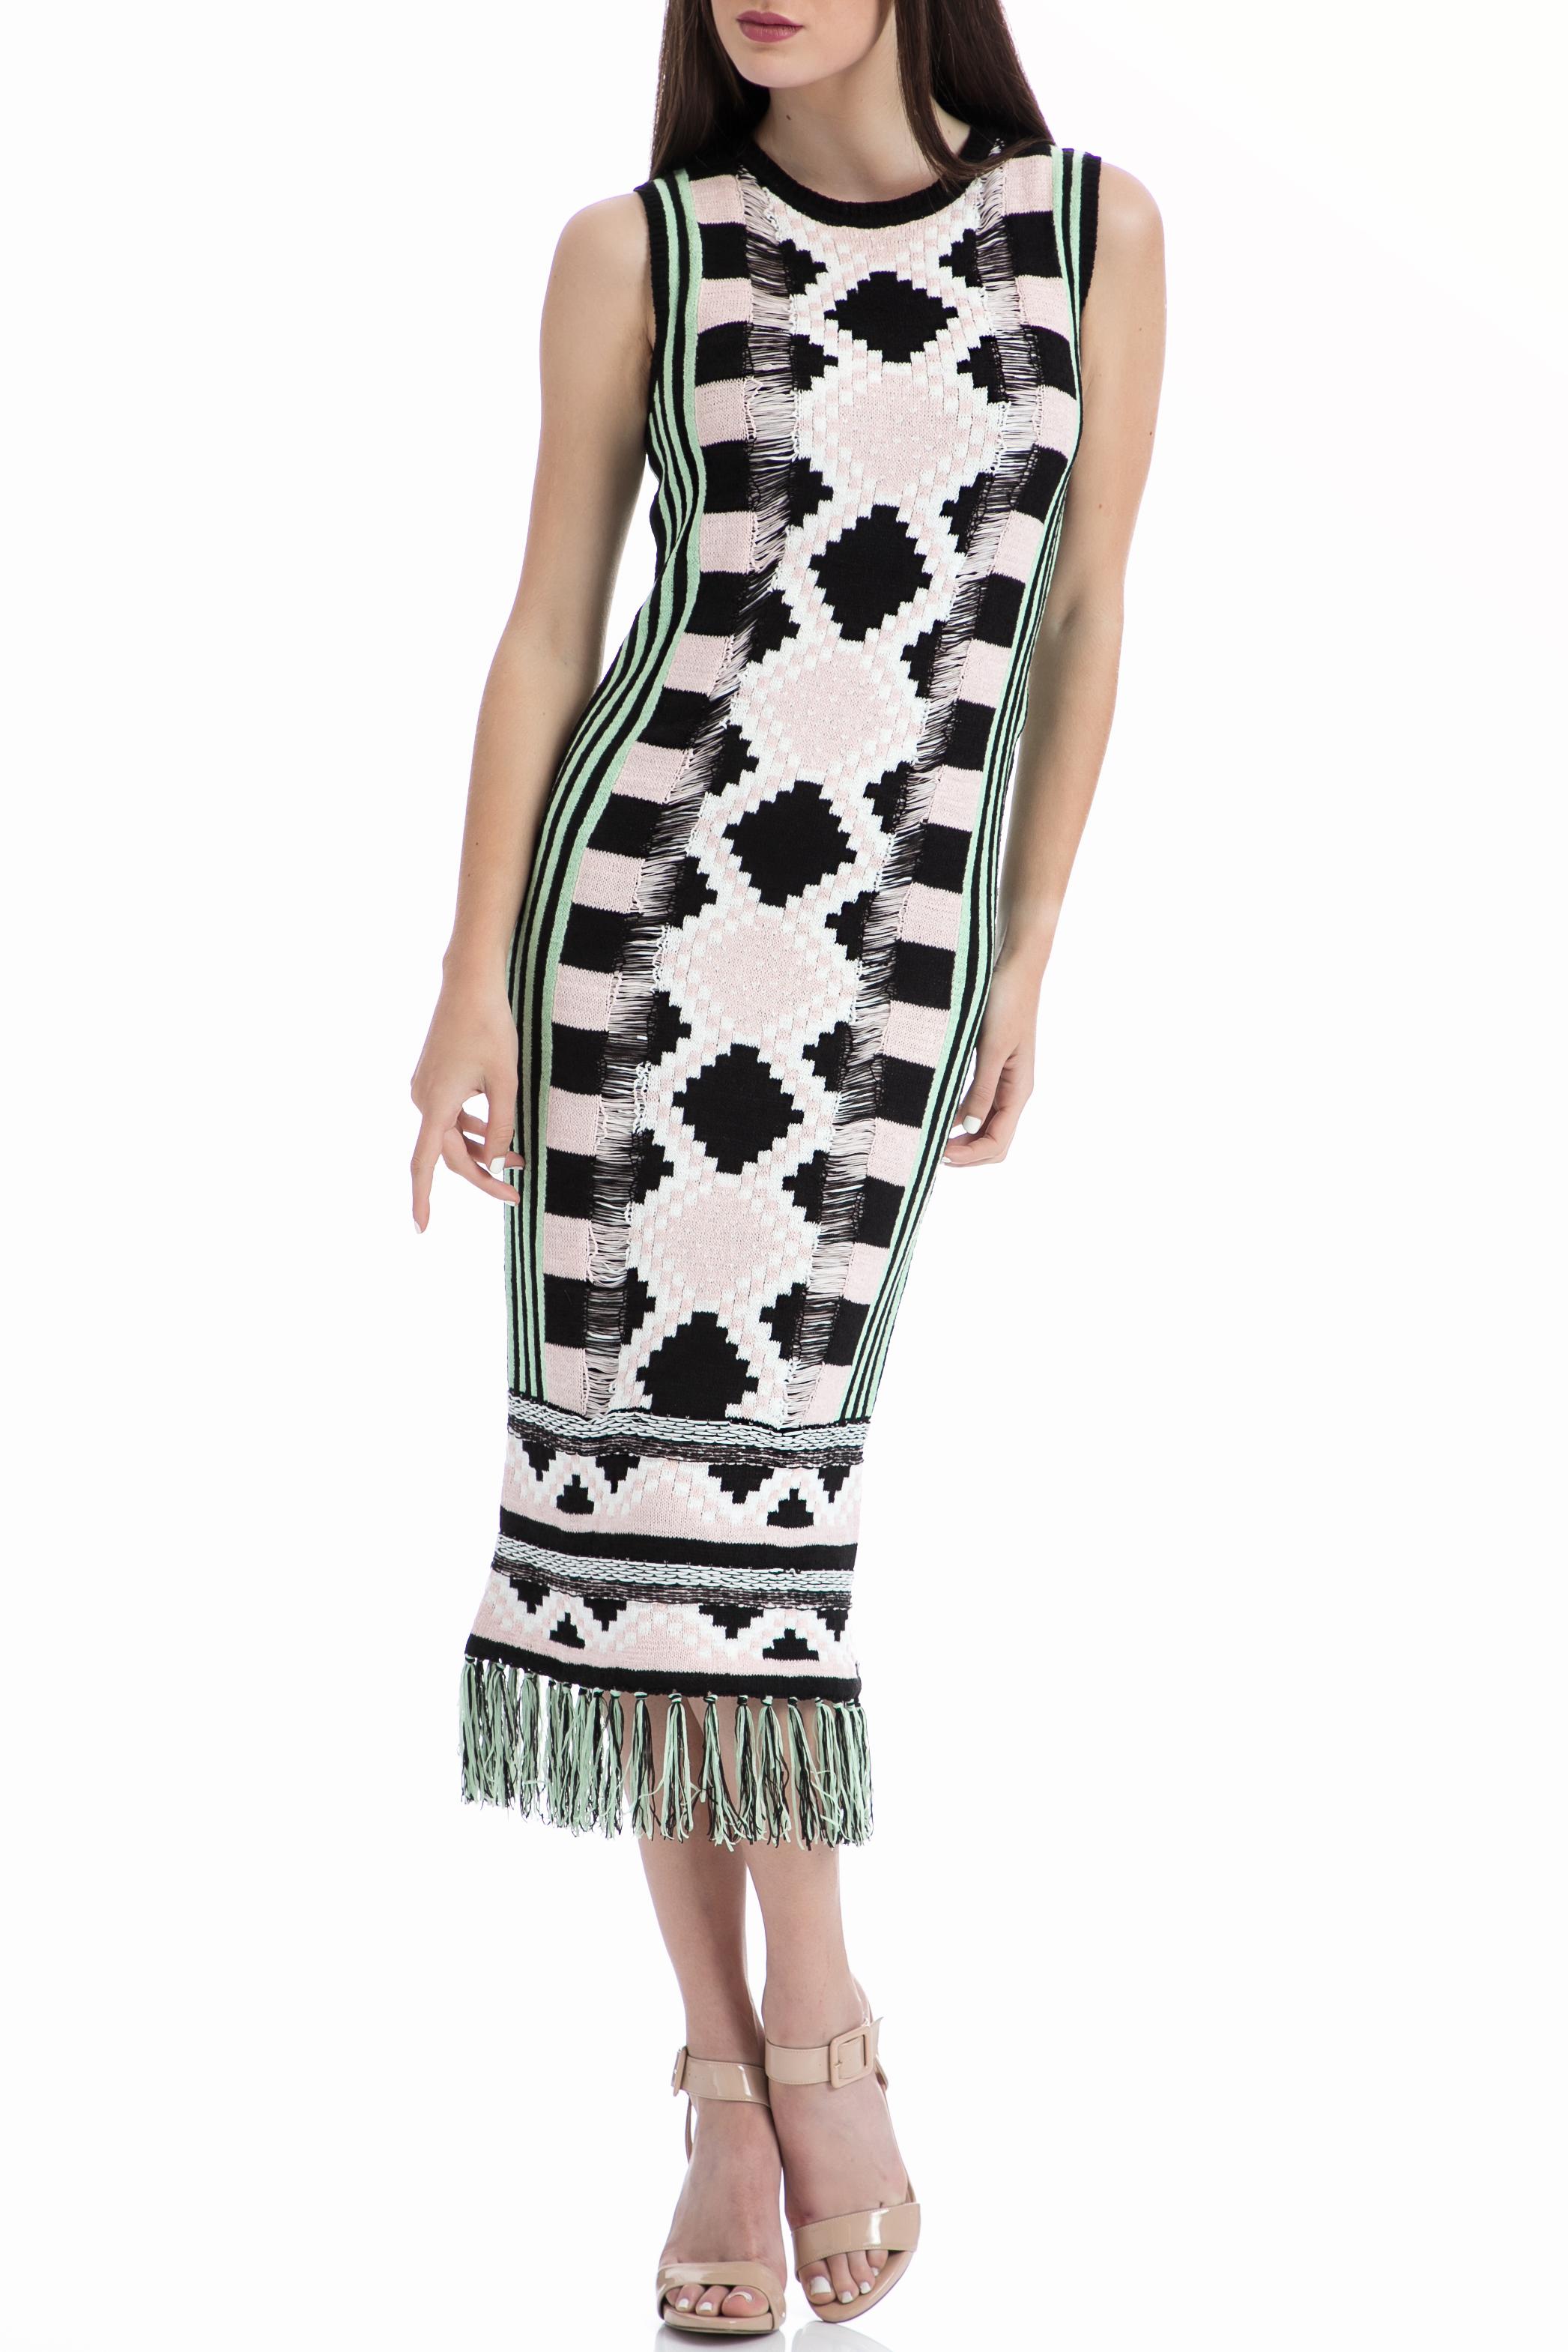 SCOTCH & SODA - Φόρεμα Maison Scotch εκρού-μαύρο γυναικεία ρούχα φορέματα μέχρι το γόνατο